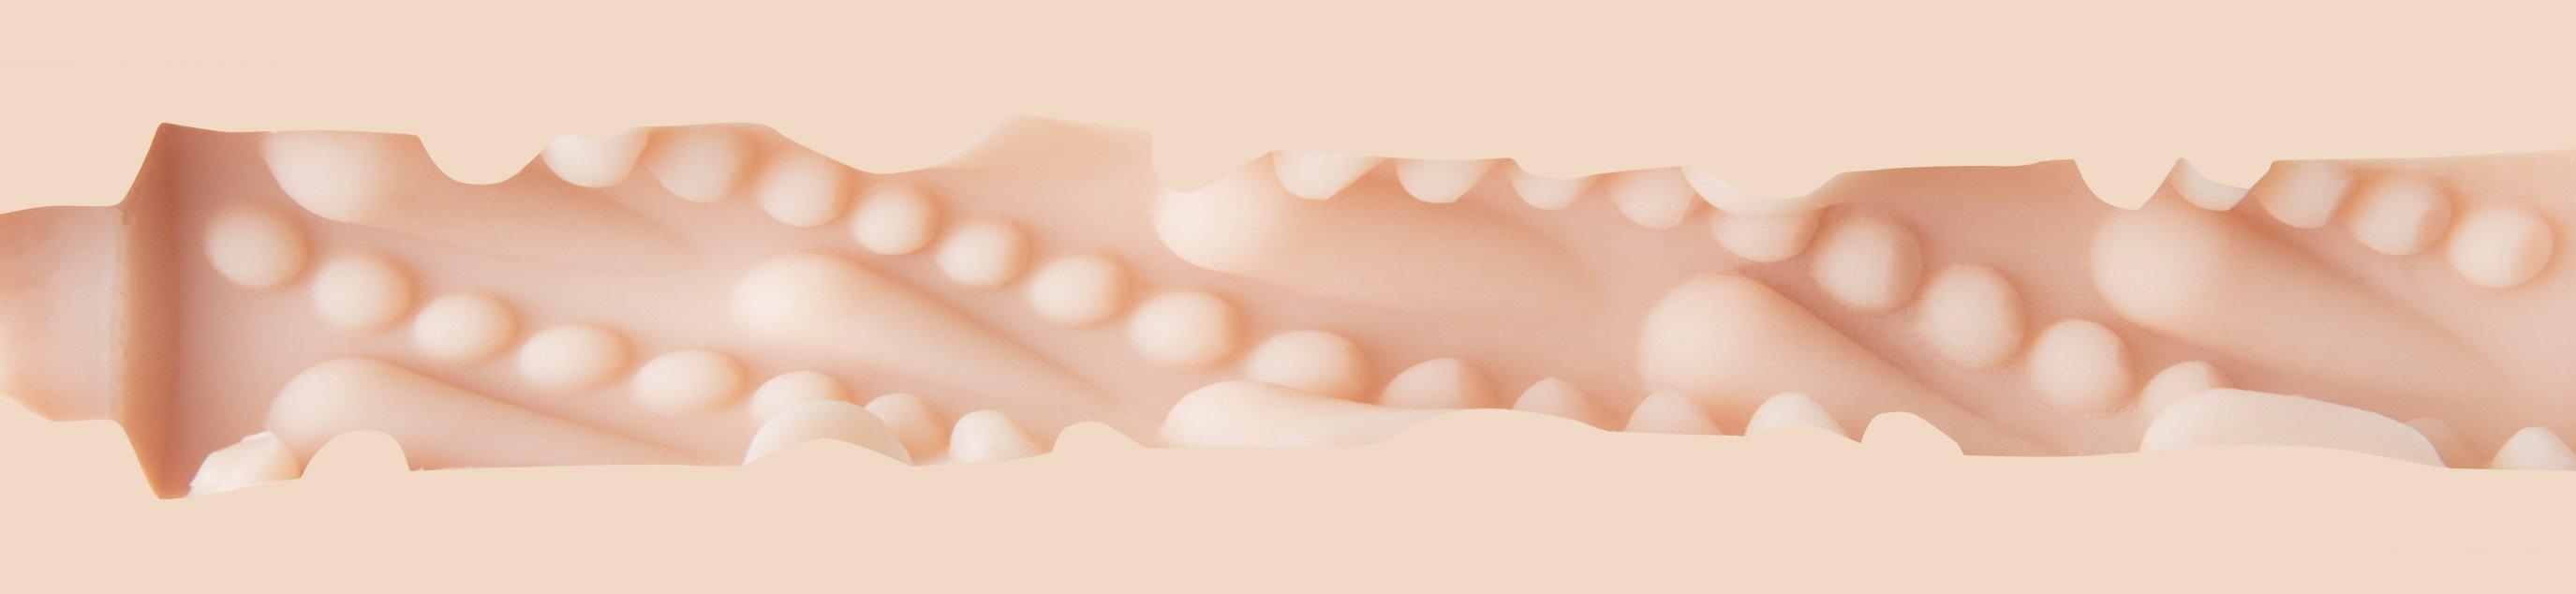 Caliente Fleshlight Girls Texture Image